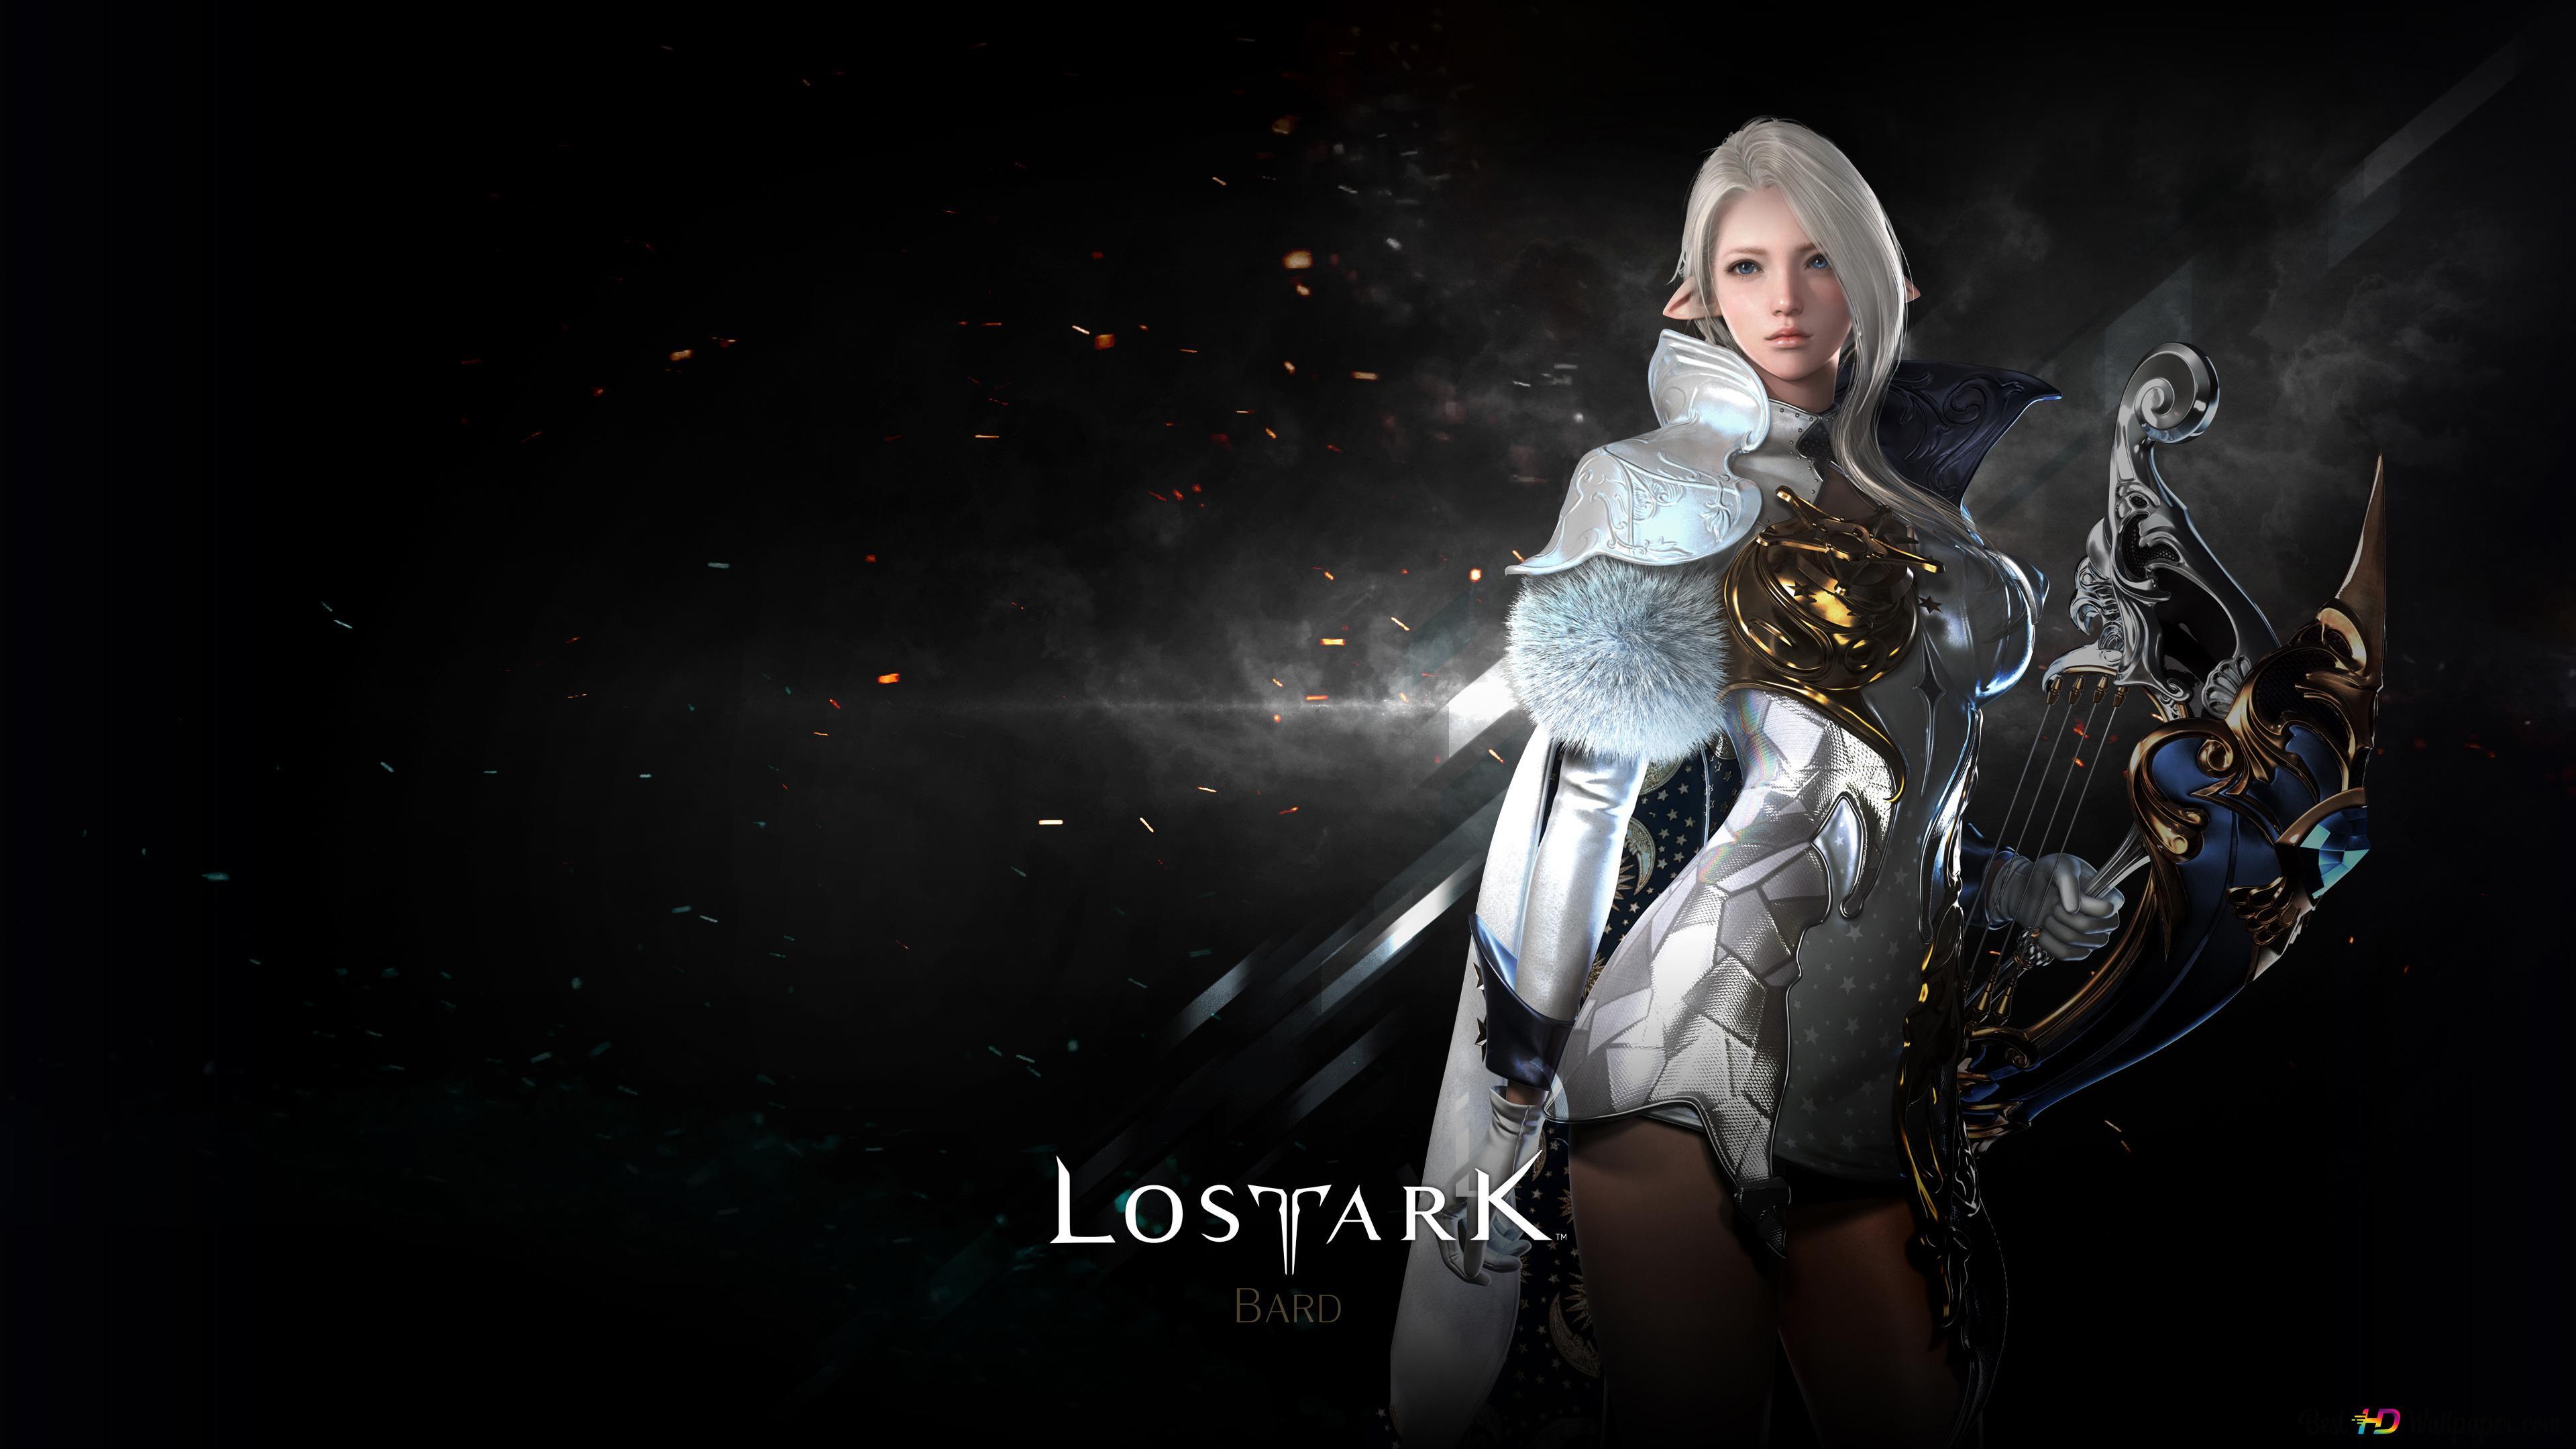 Lost Ark Video Game Bard Hd Wallpaper Download